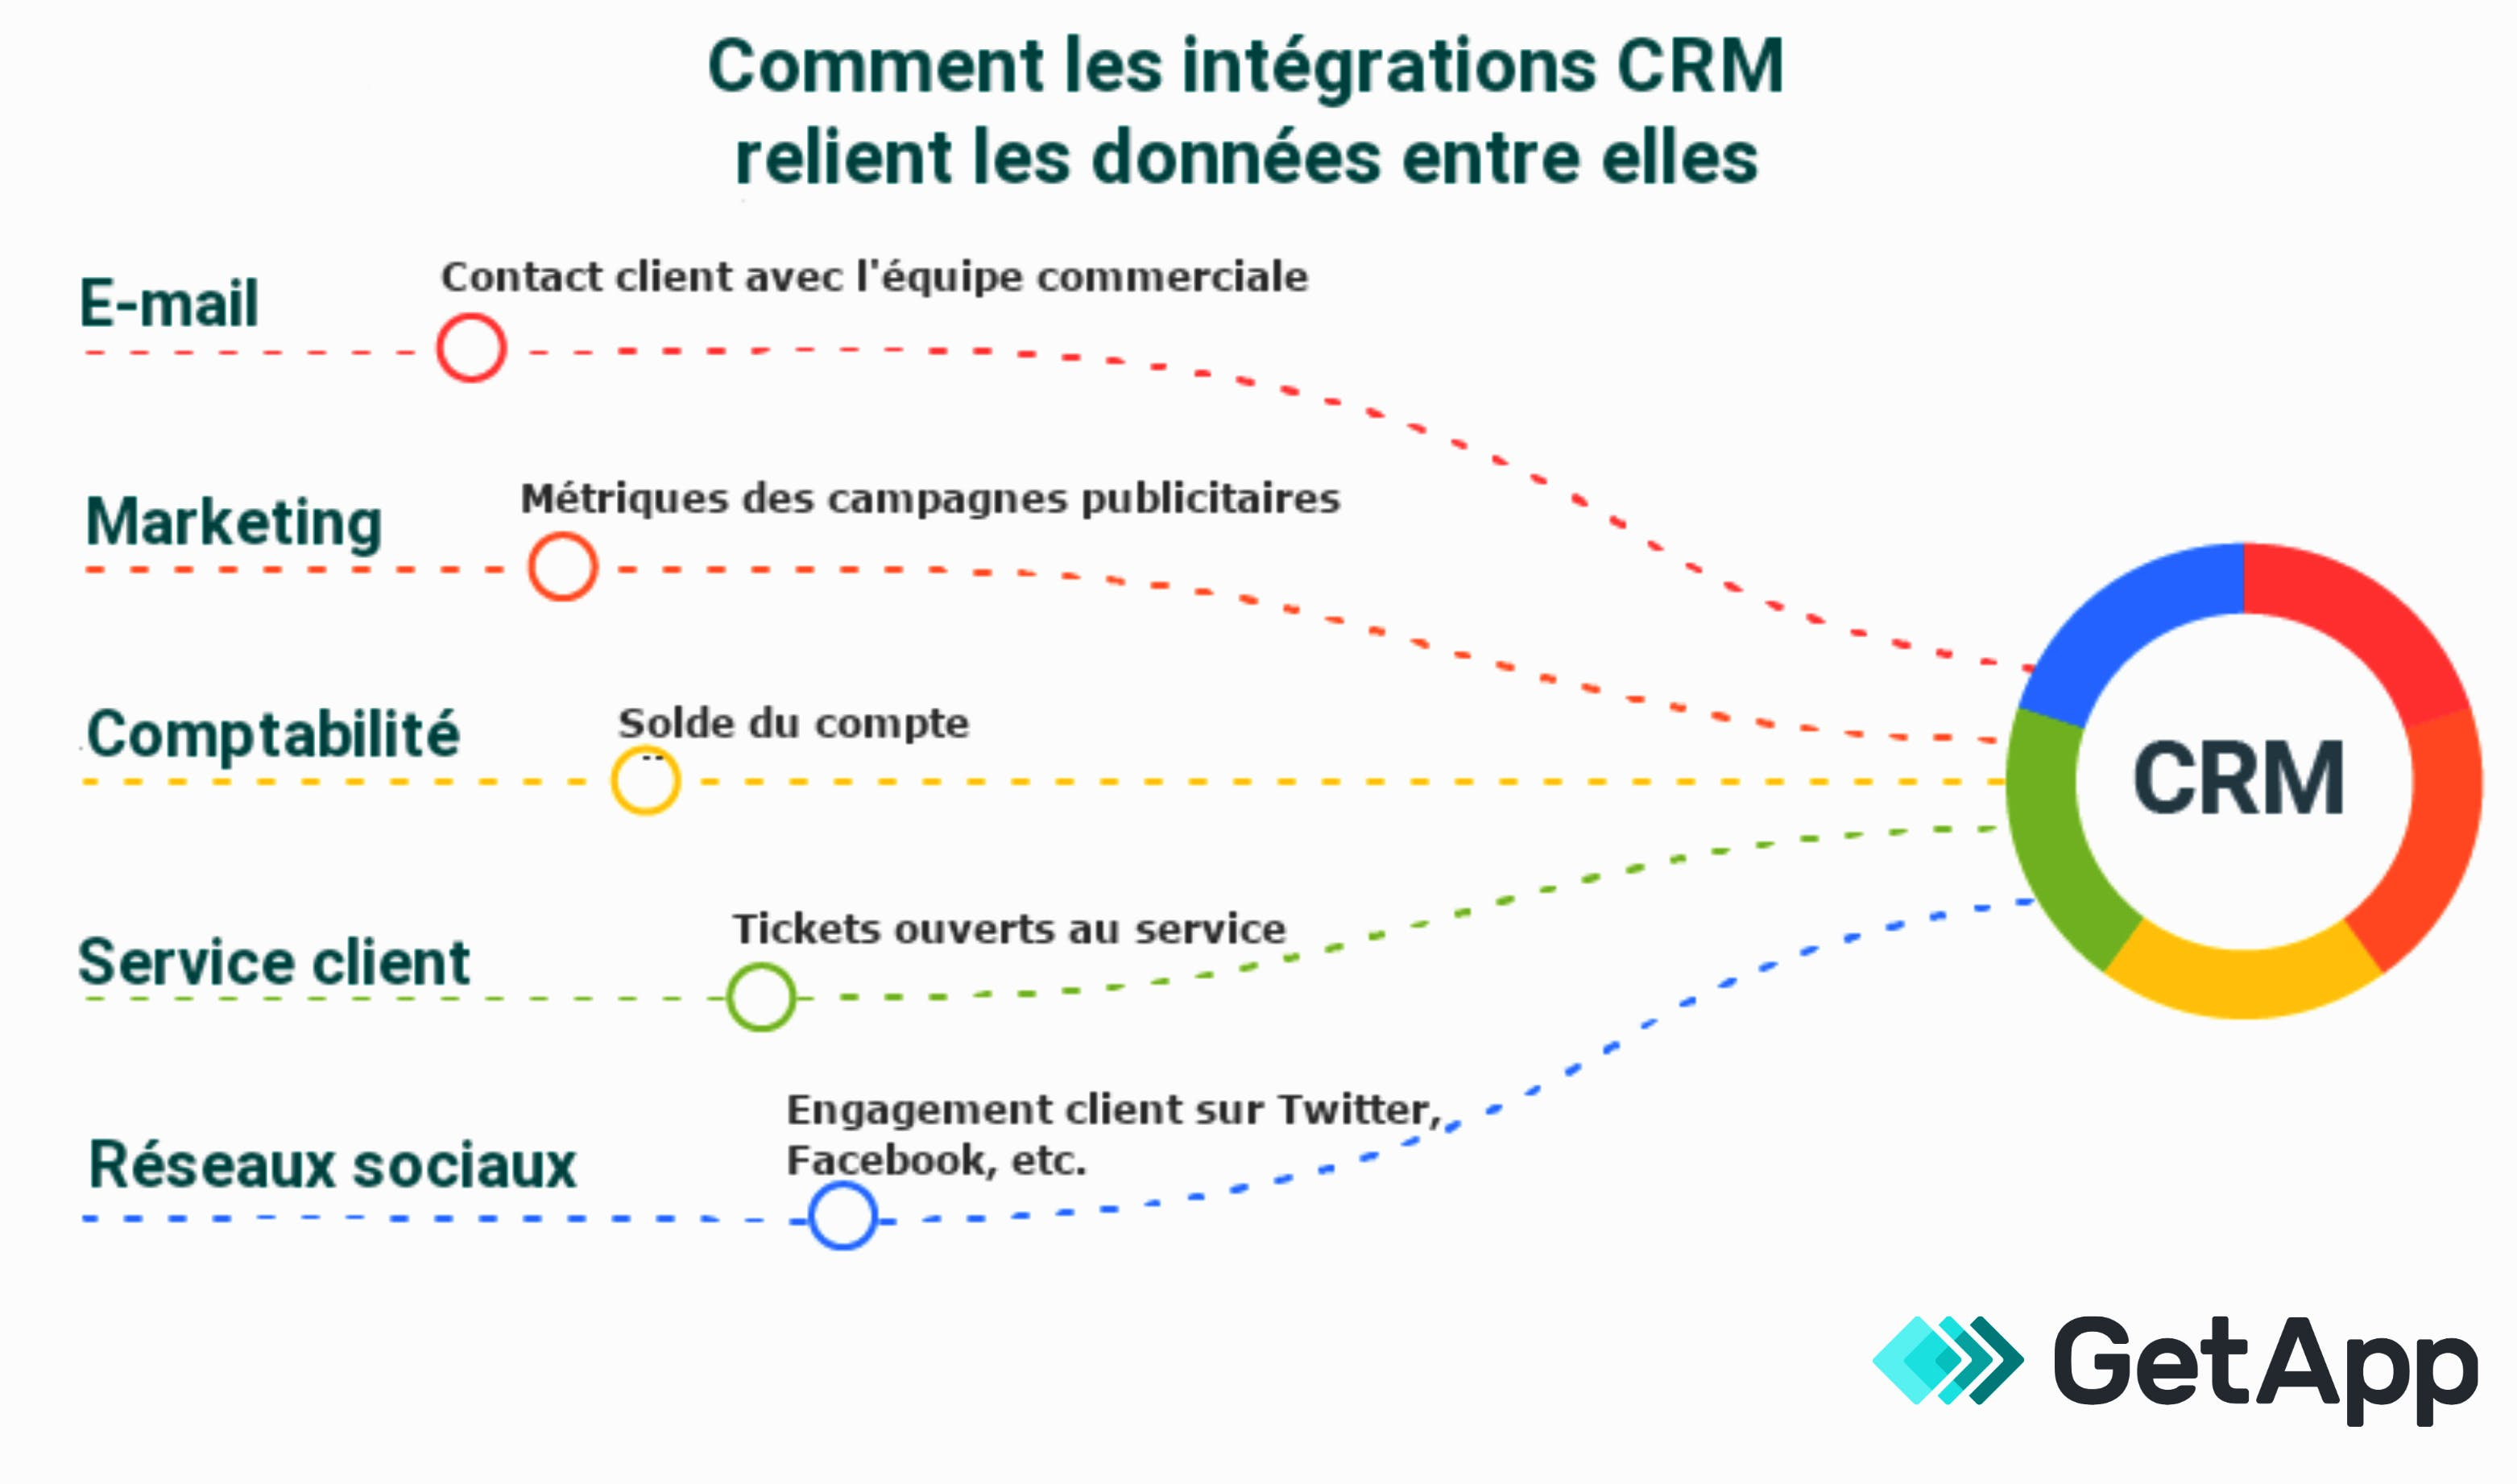 Infographie GetApp Intégration CRM